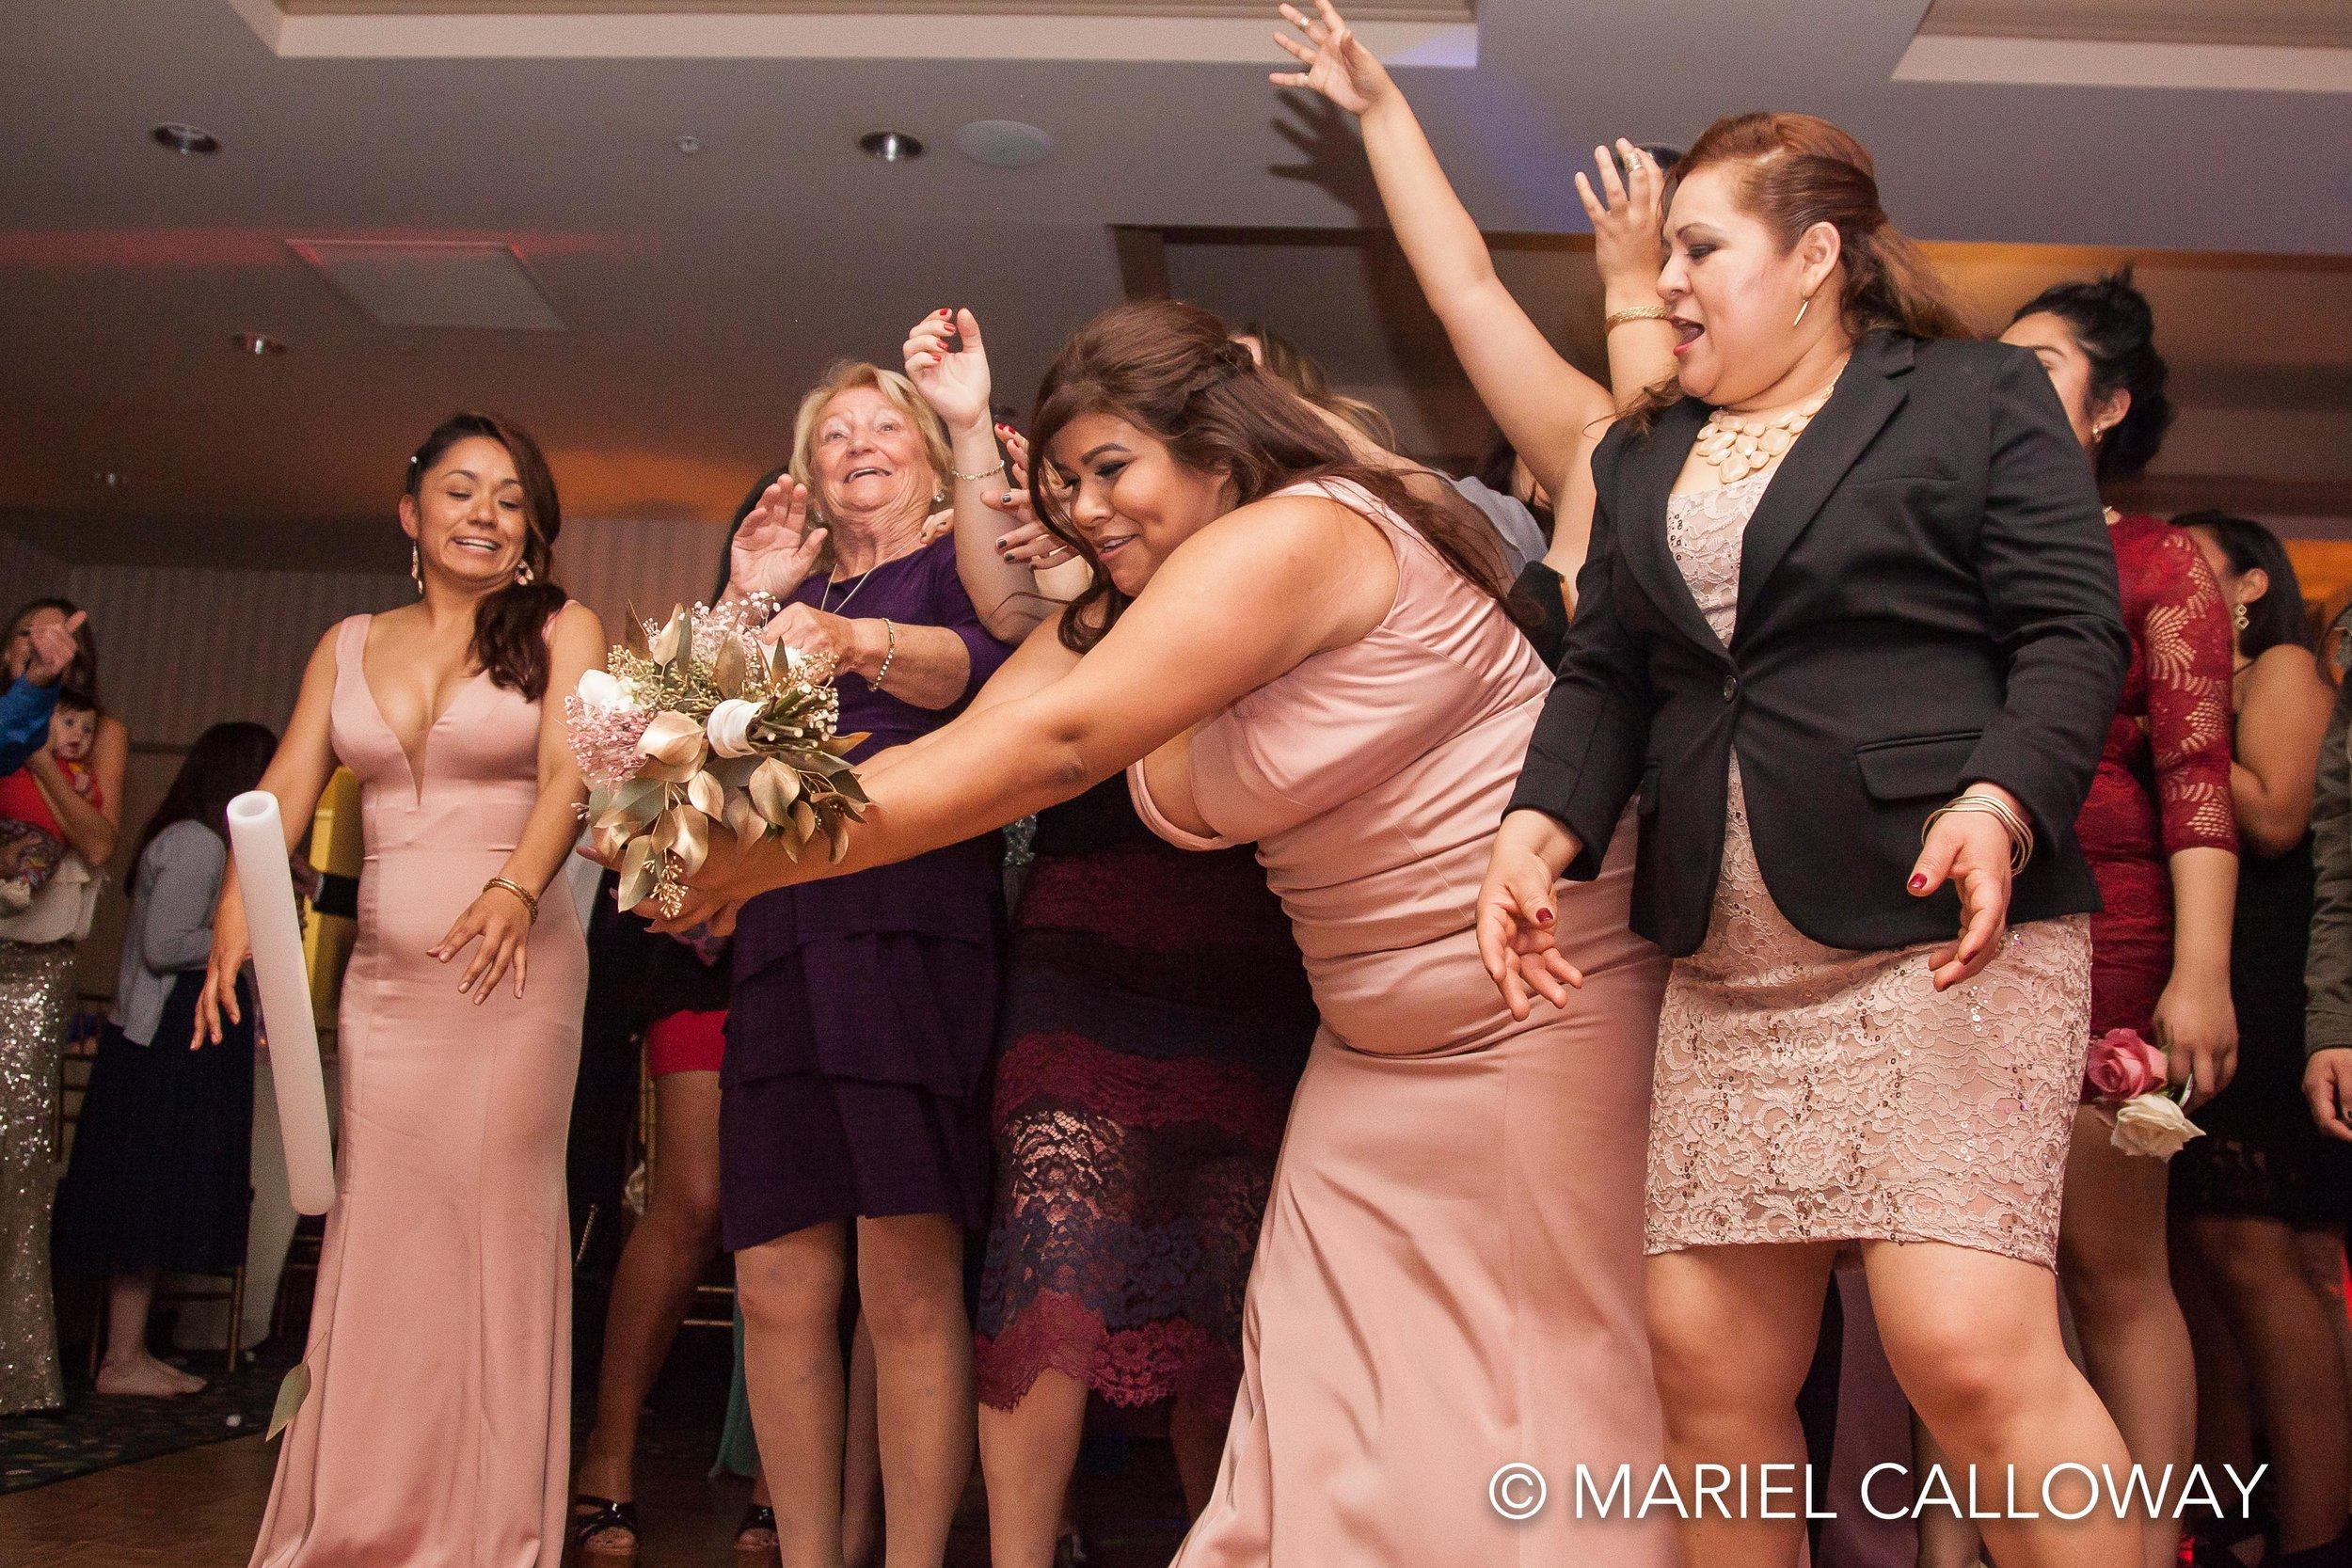 Mariel-Calloway-Los-Angeles-Wedding-Photography-Rossi-69.jpg